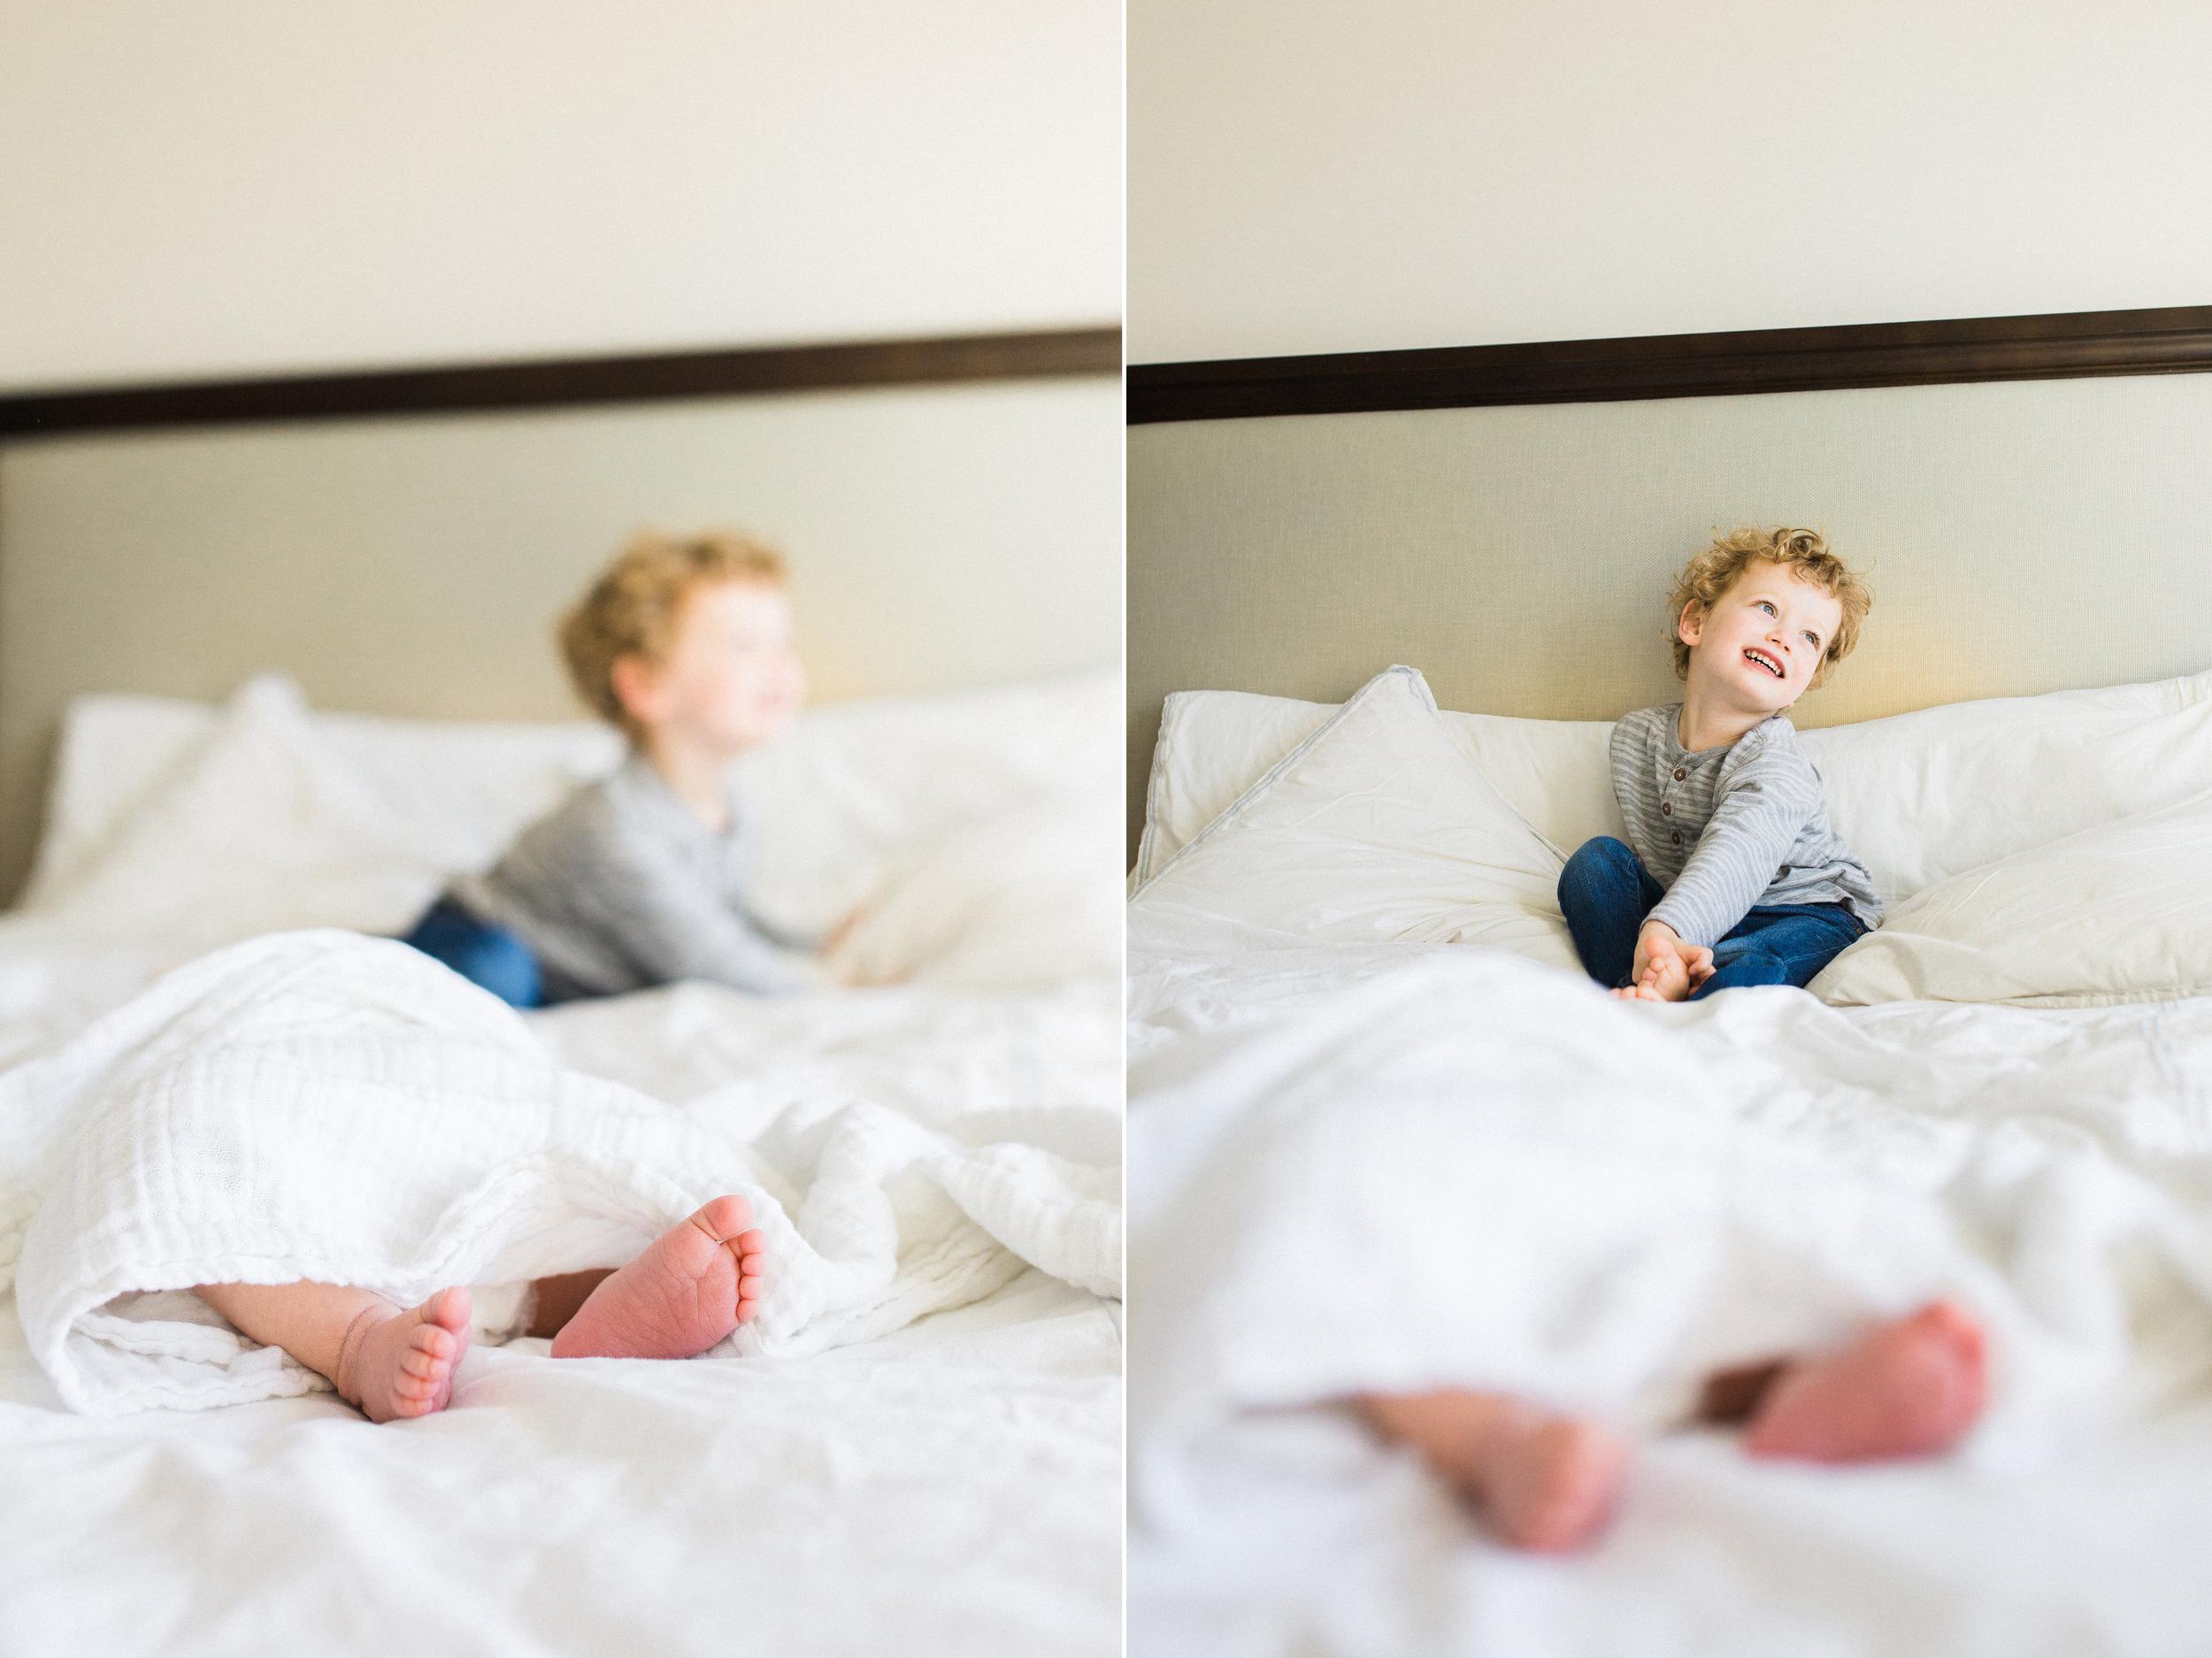 brooklyn-heights-newborn-photography_nyc.jpg